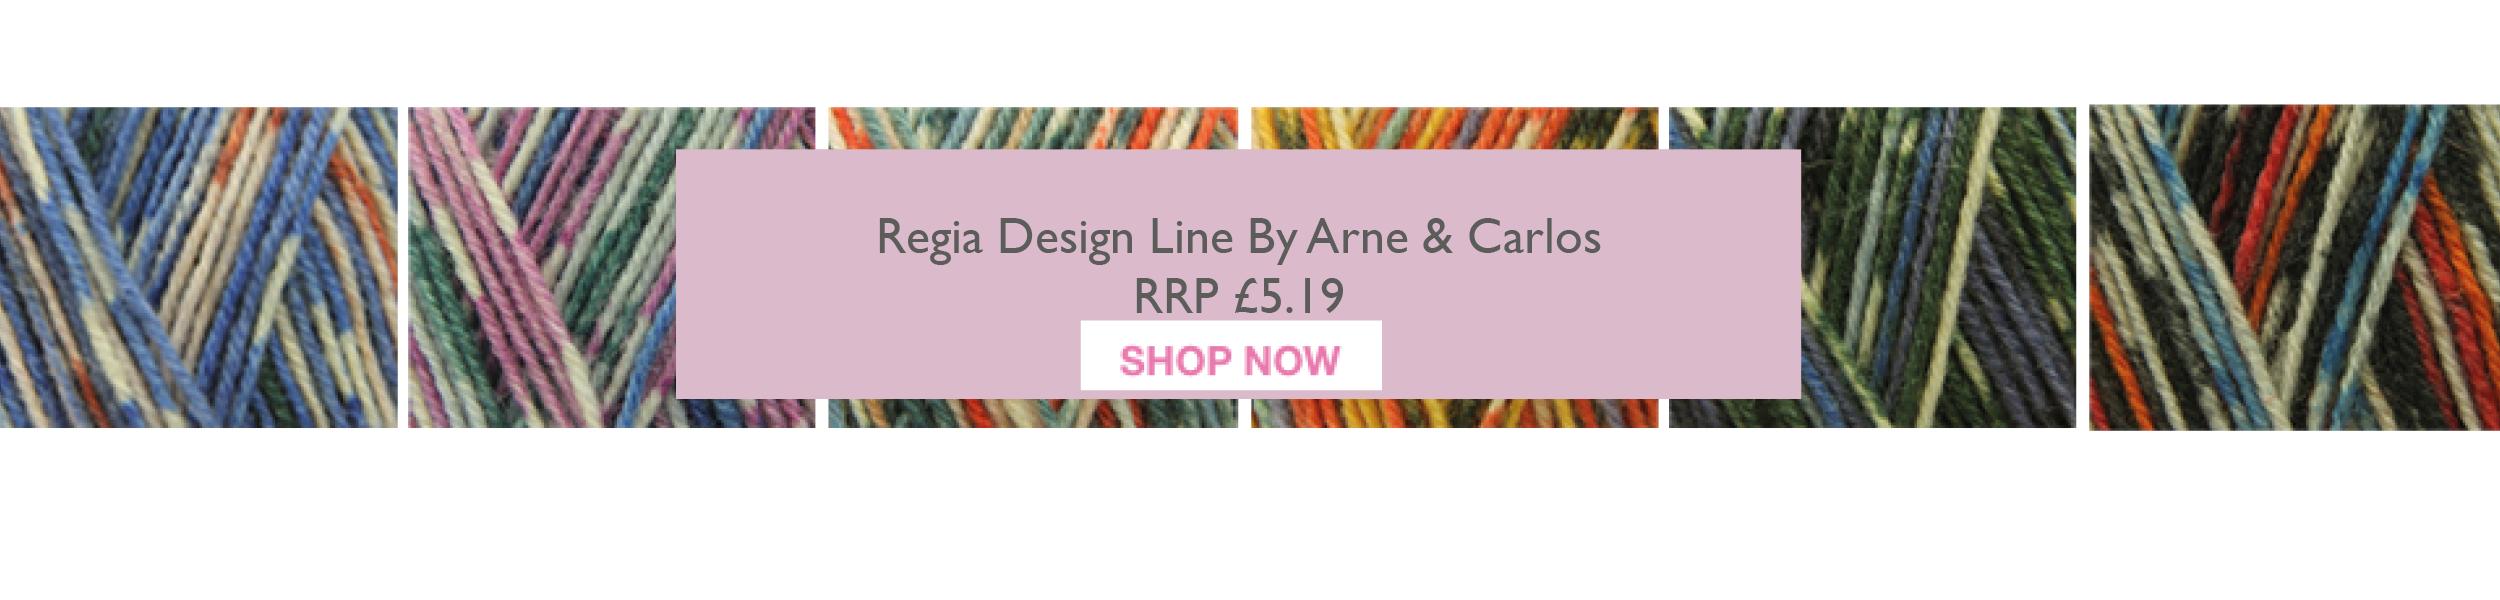 arne & carlos products 1